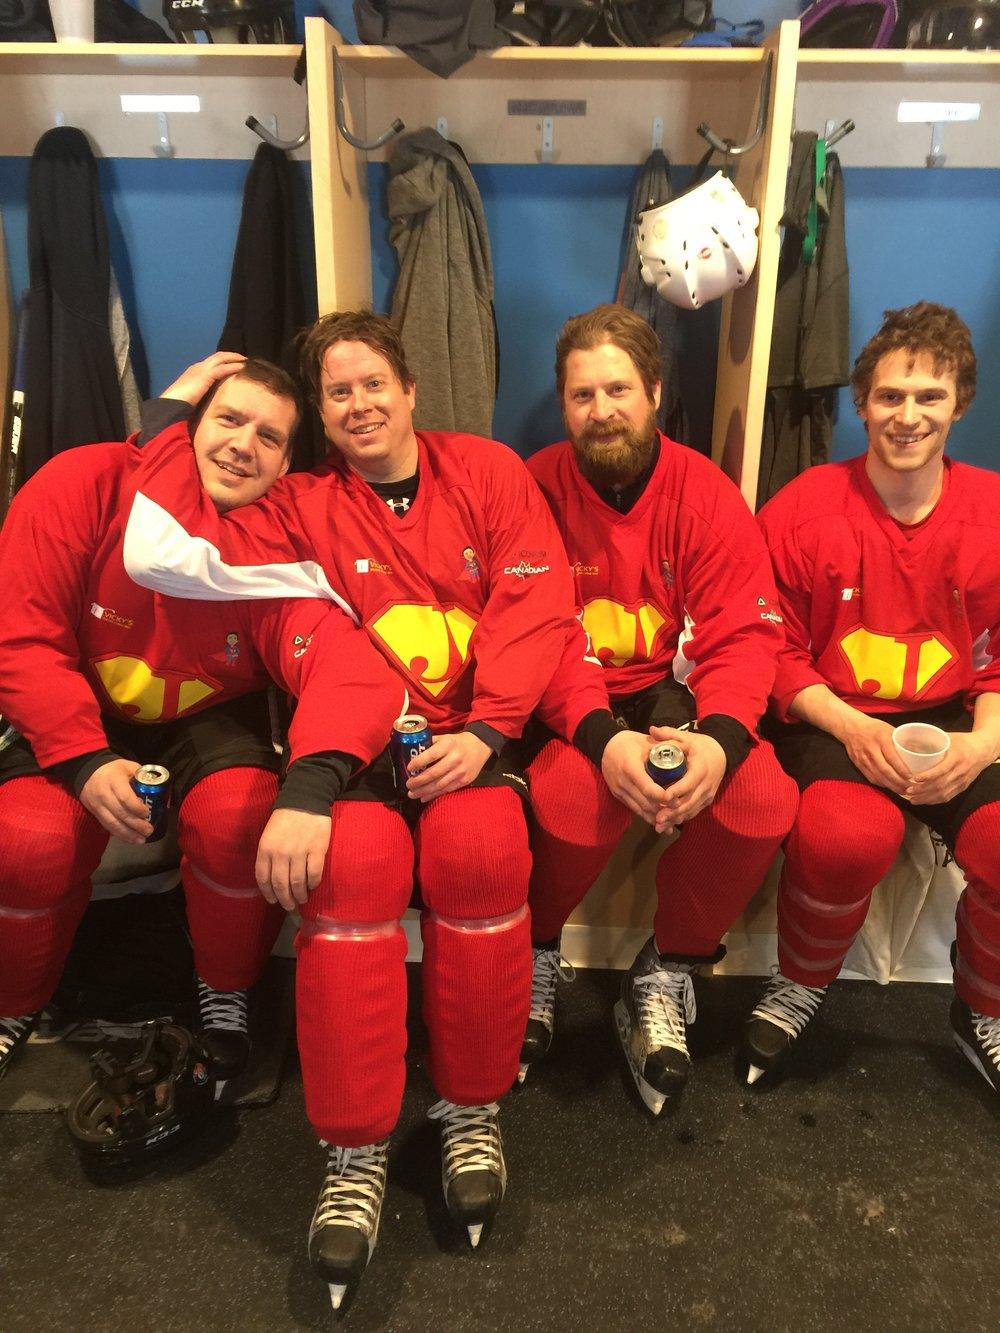 Jacob's Wish Fundraiser - hockey players